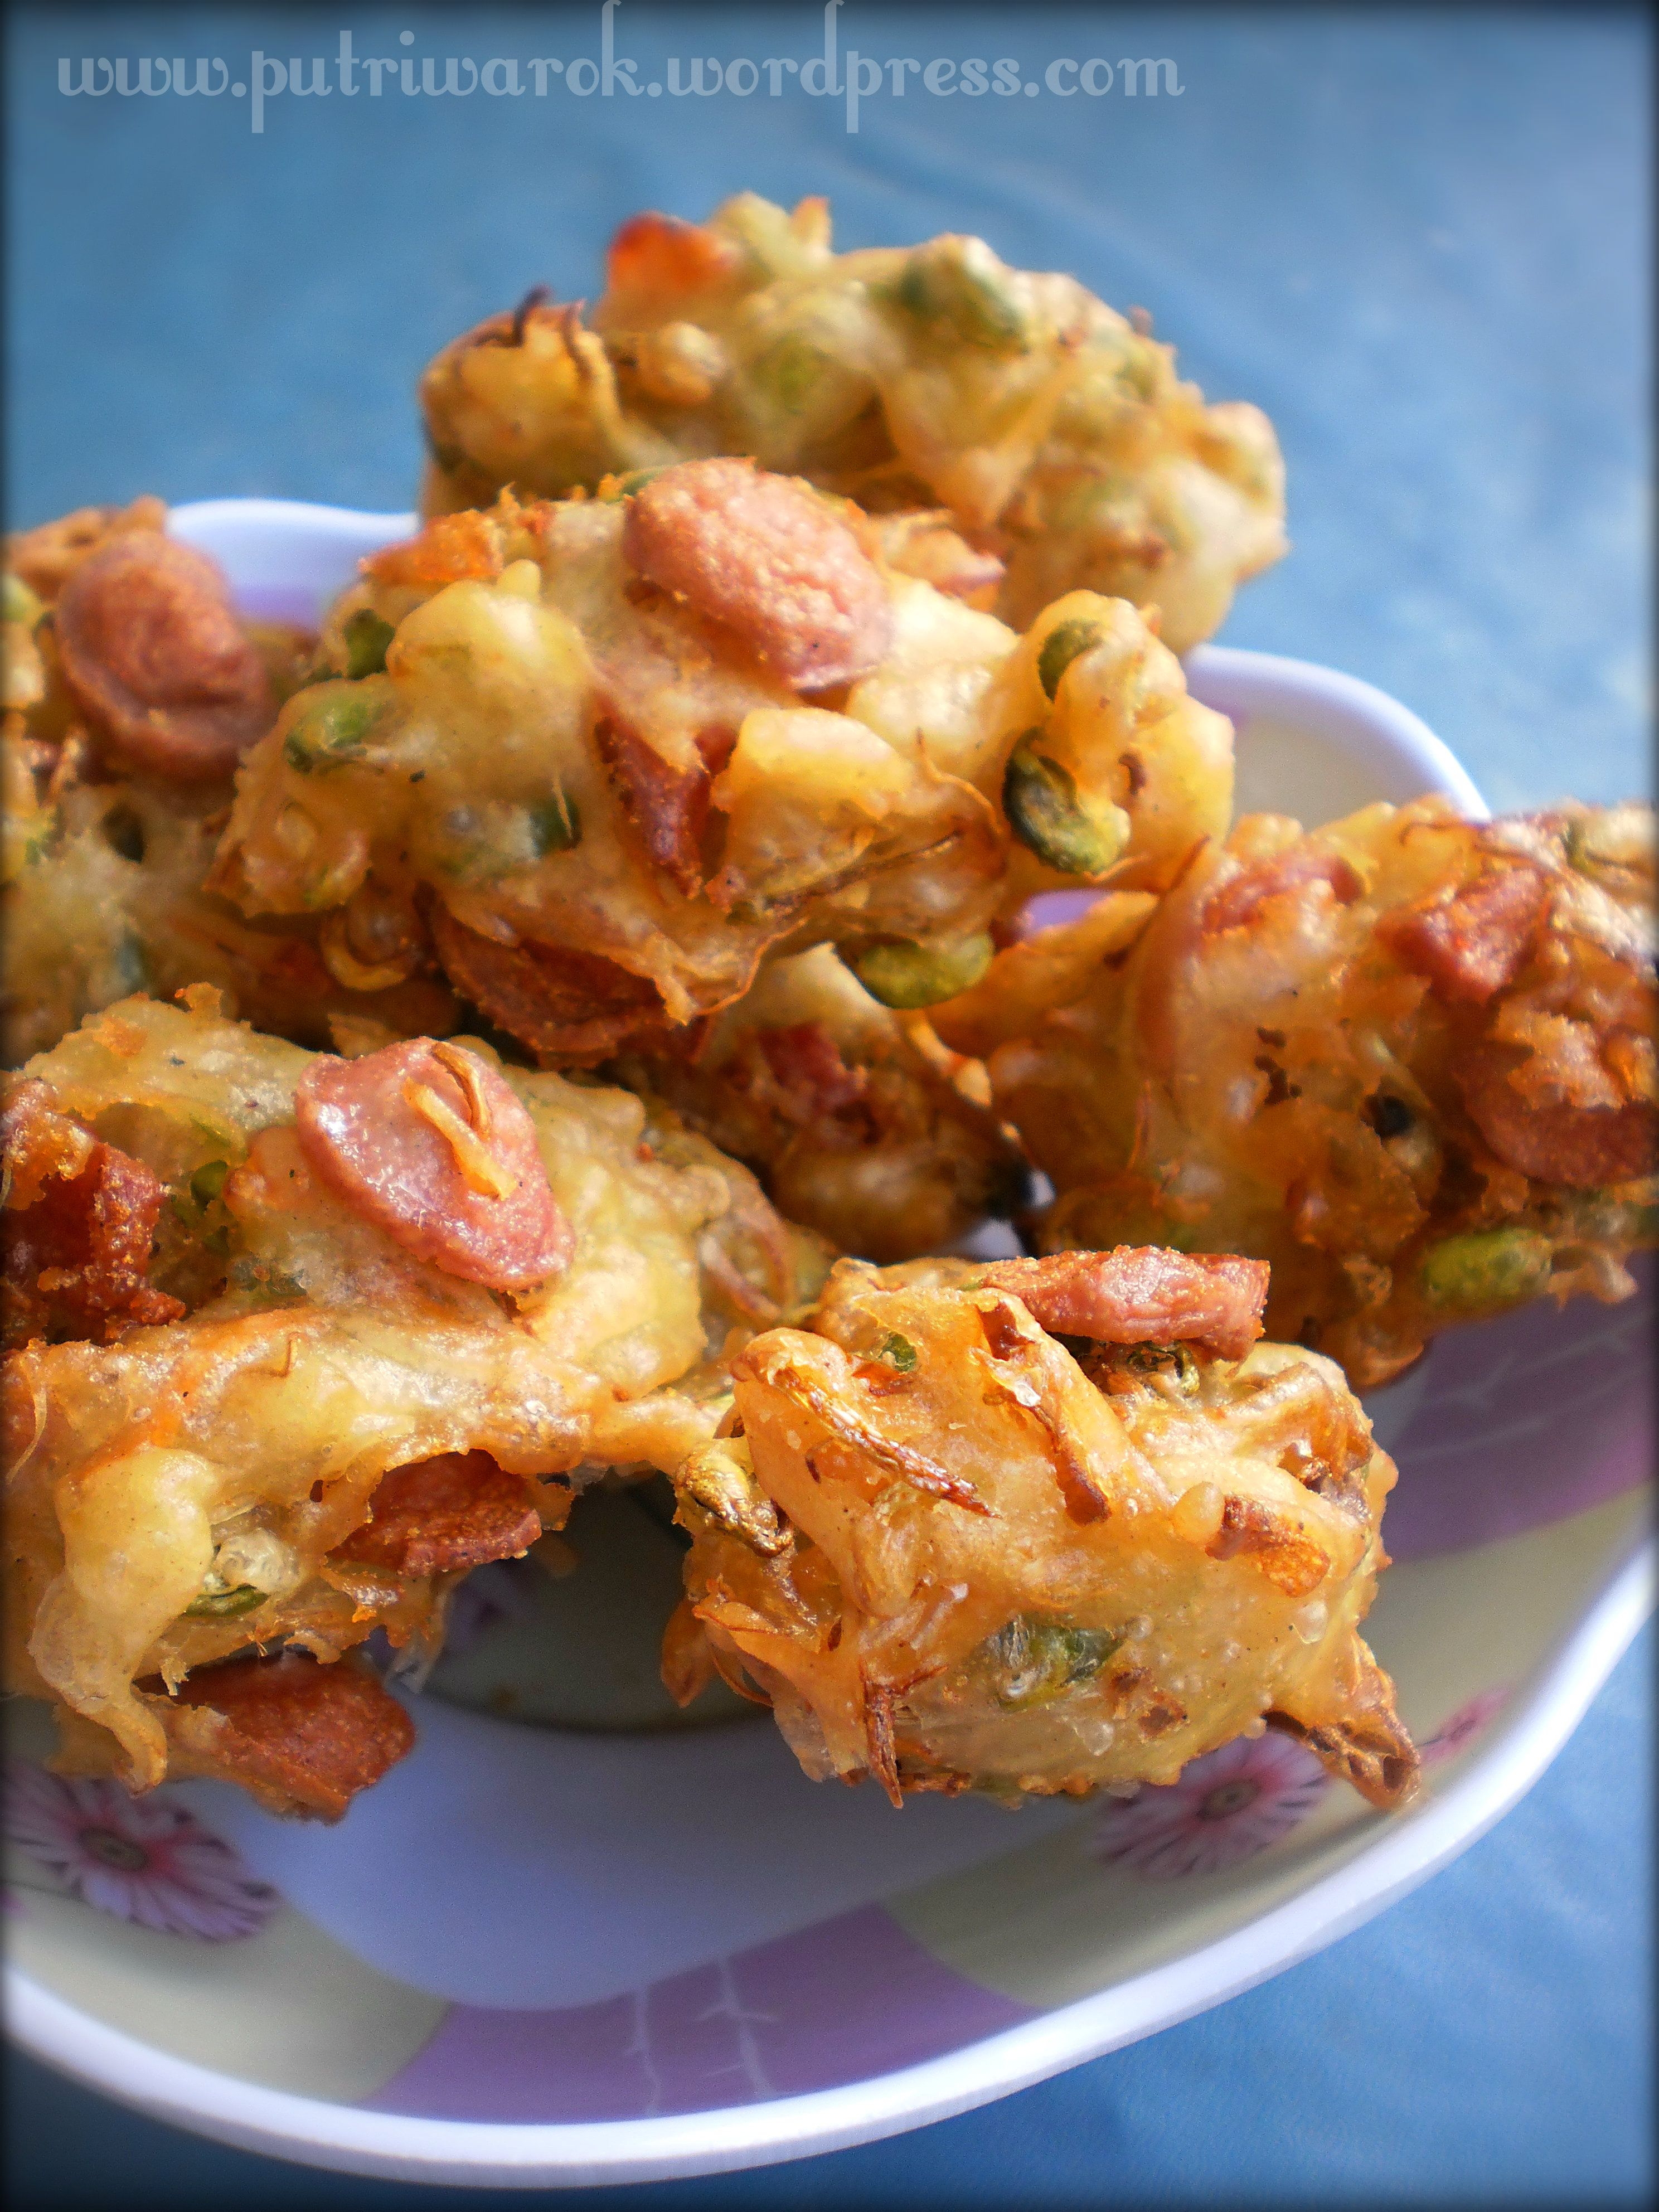 Bakwan Sayur Campur Sosis Ayam Ote Ote Piya Piya Heci By Nisa Tsvetkova Sosis Resep Dapur